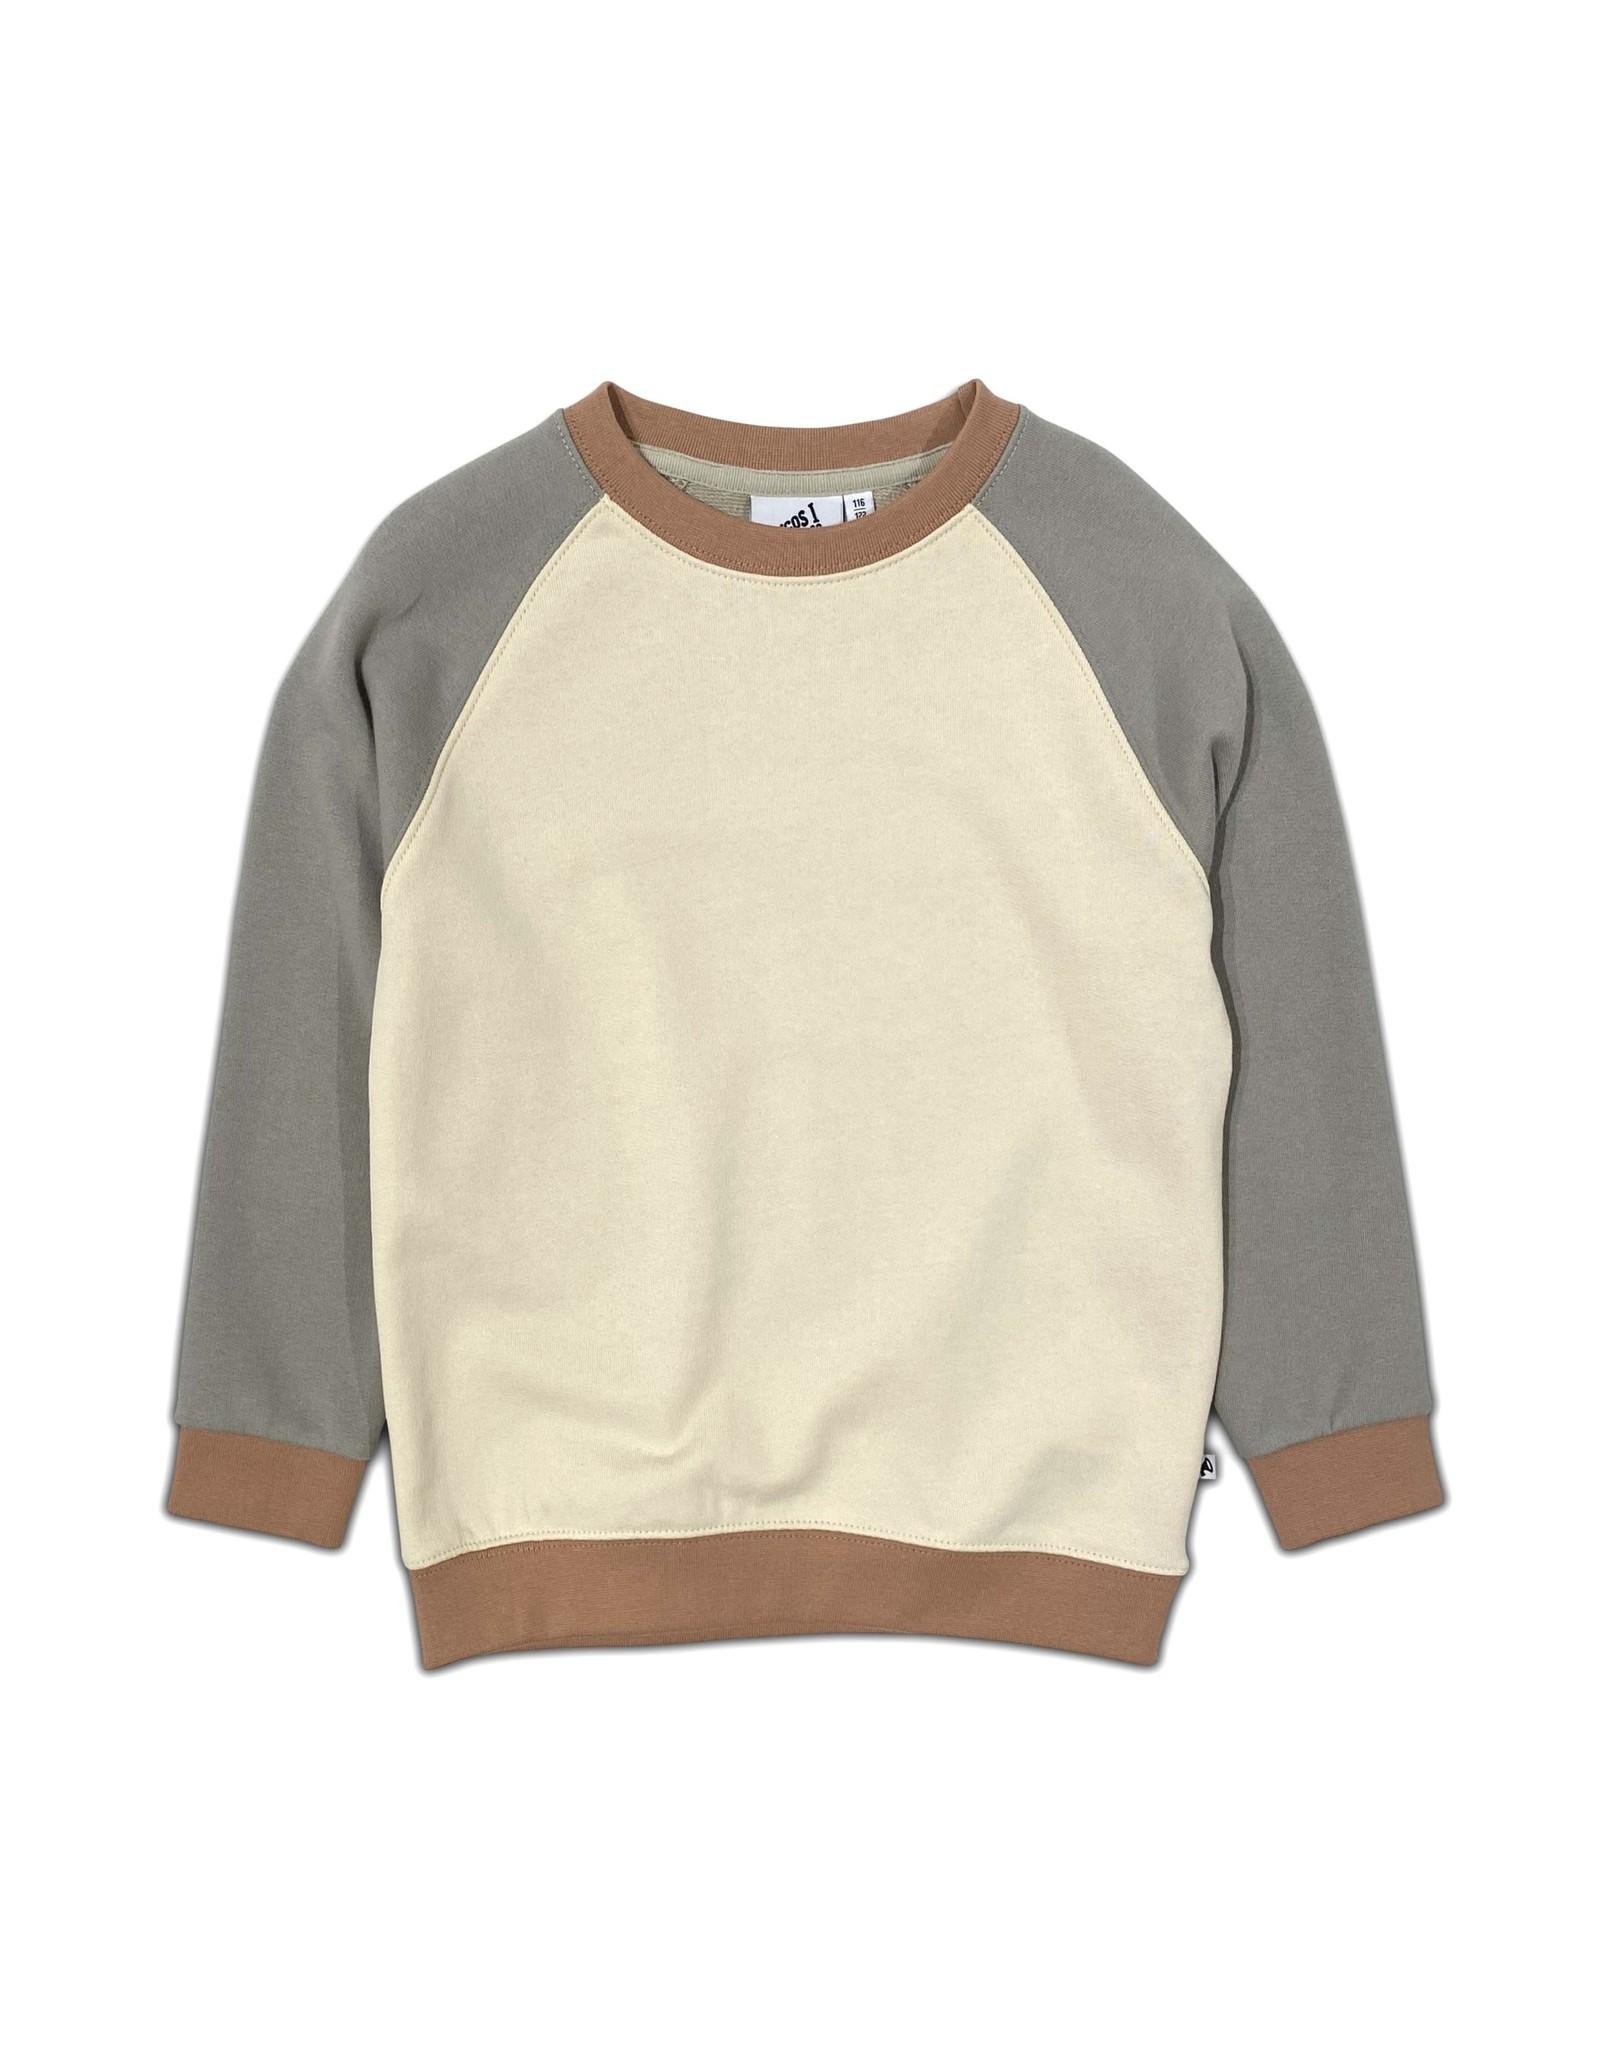 Cos I Said So sweater color block (pastel)